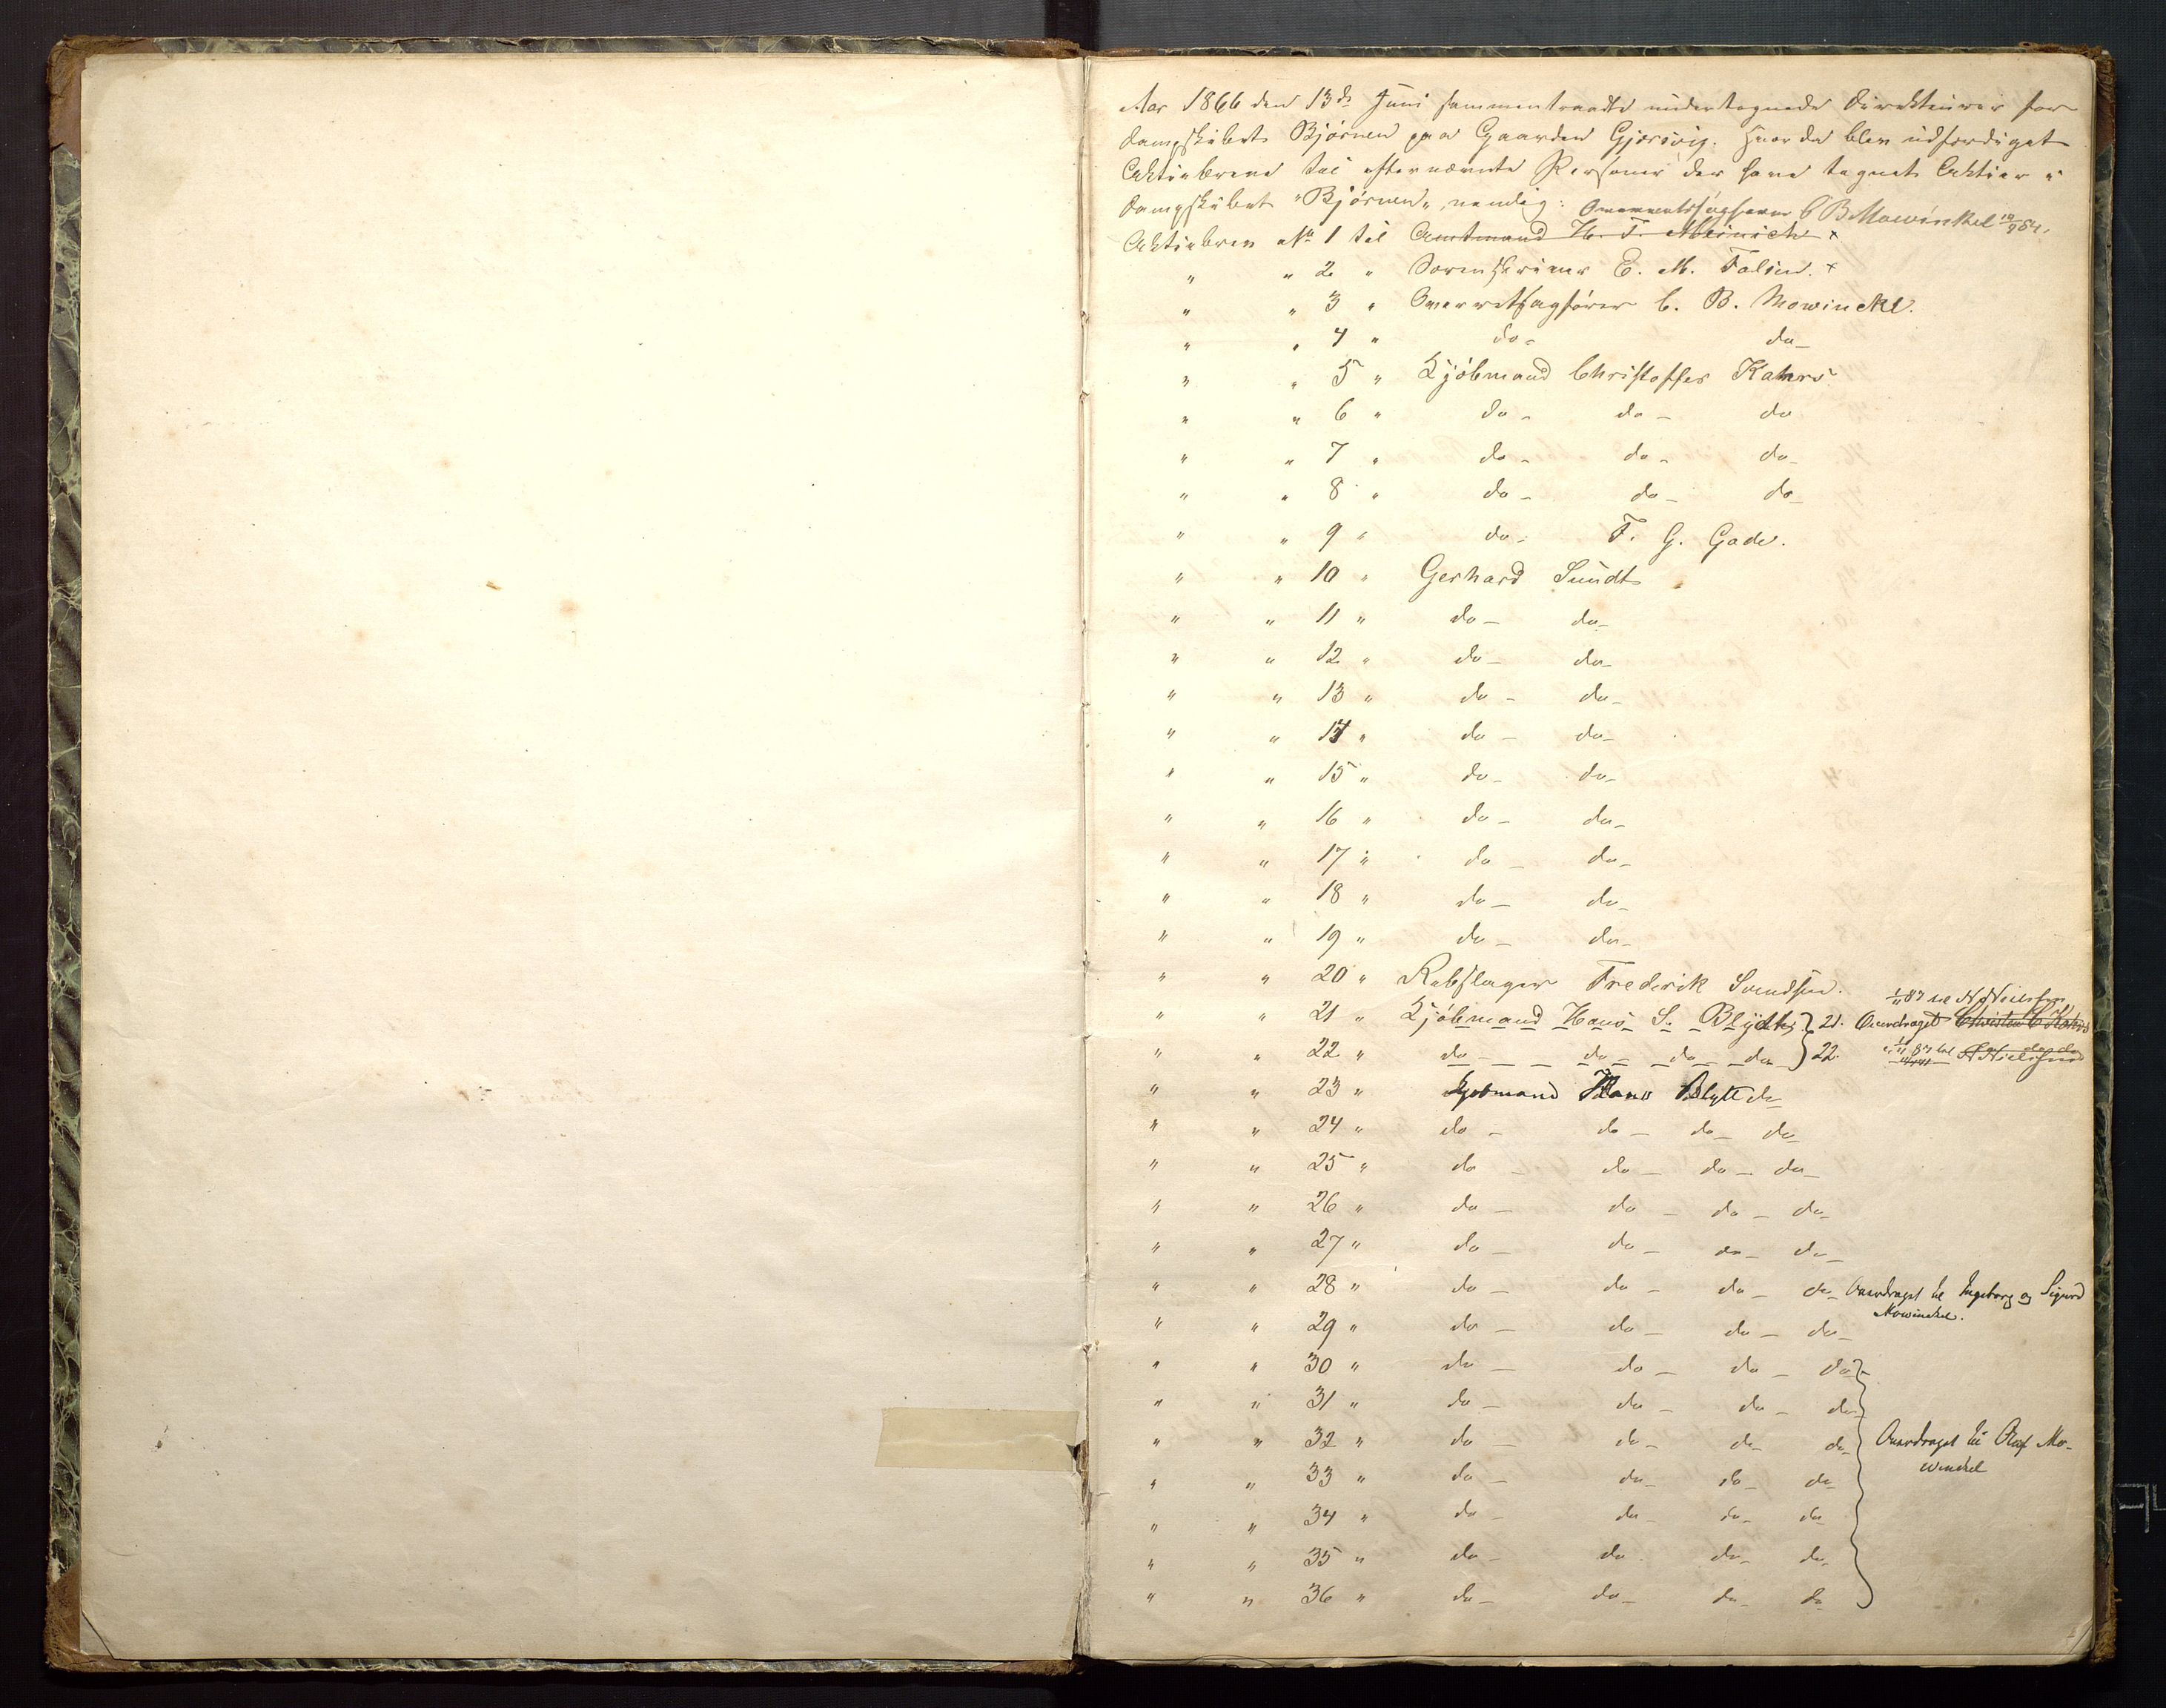 IKAH, Dampskipet DS Bjørnen, A/Aa/L0001: Styreprotokoll for DS Bjørnen, 1866-1891, s. 1